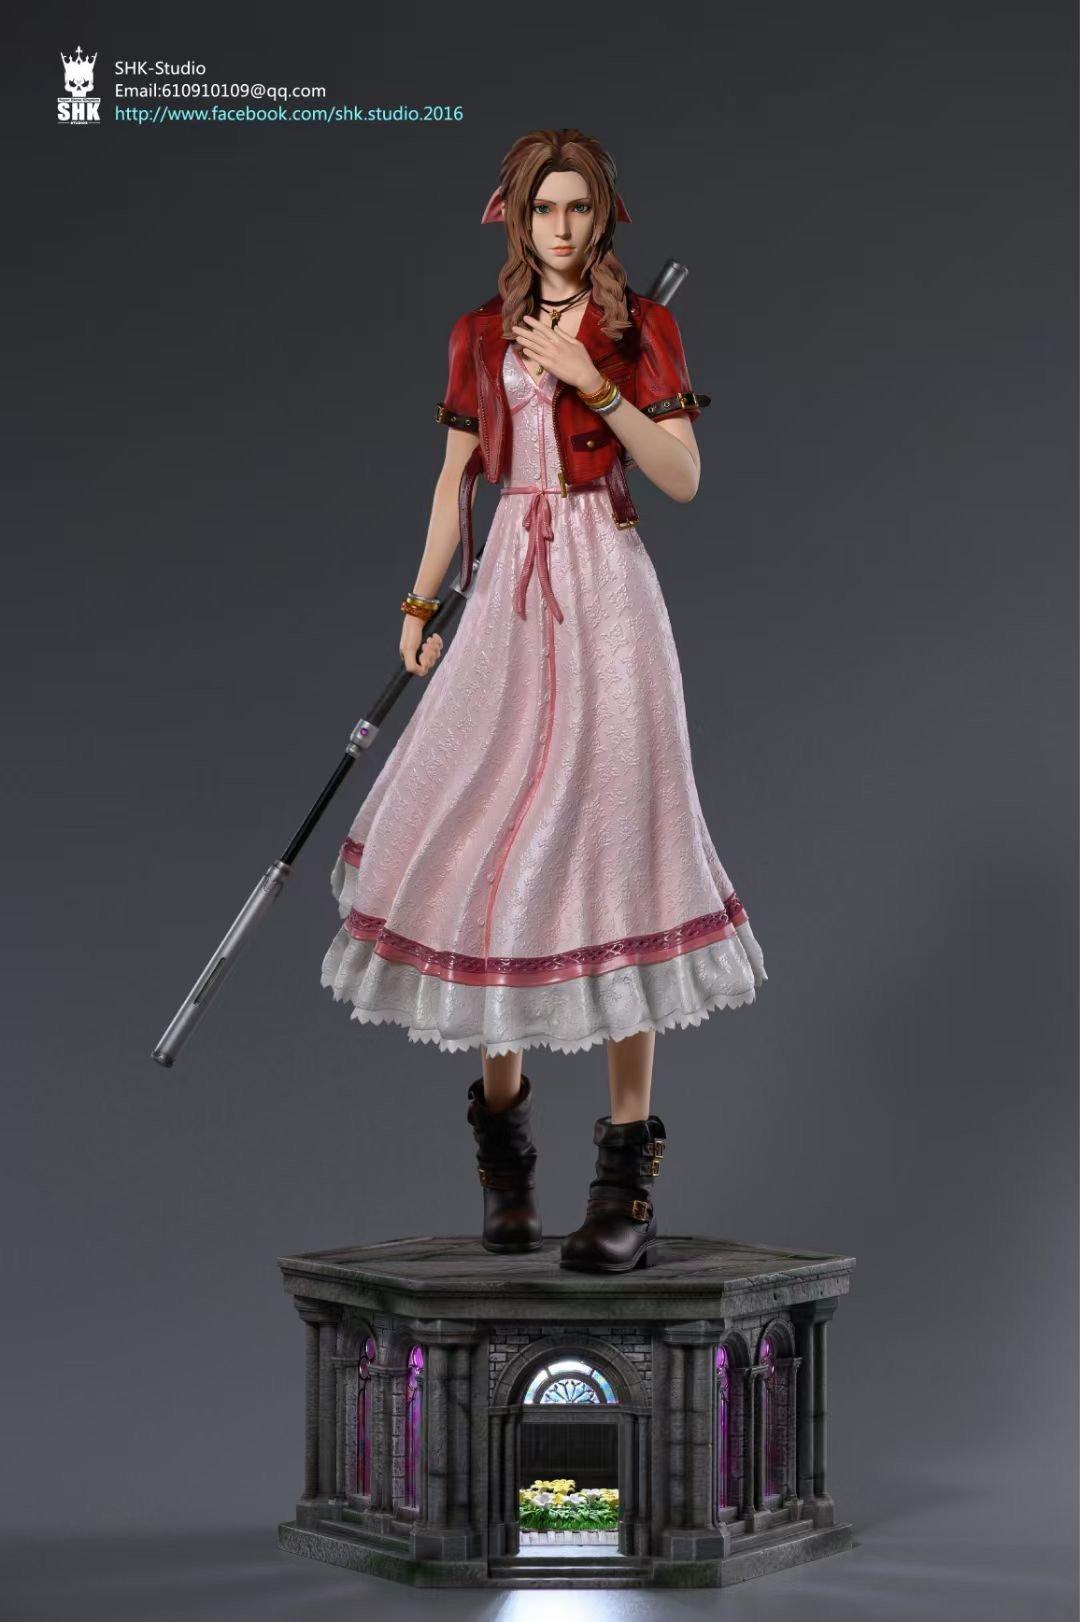 Image of [Pre-Order]Final Fantasy VII SHK Studio Aerith 1:4 Resin Statue